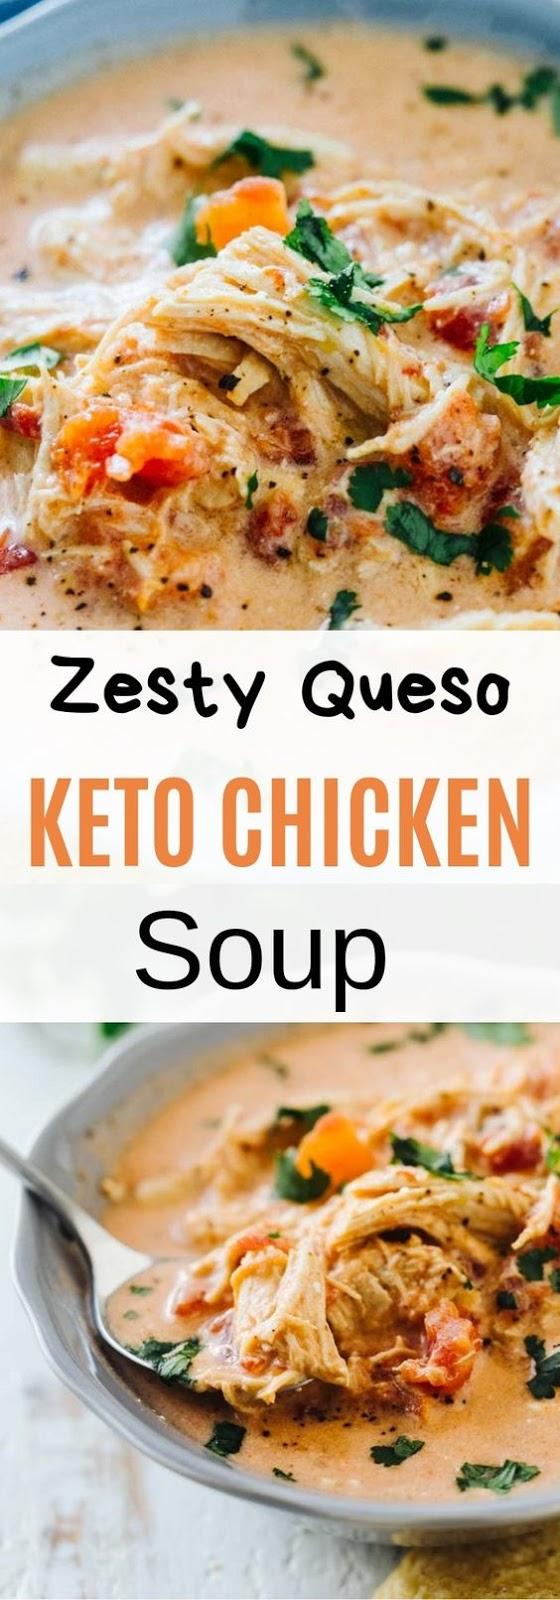 Zesty Queso Keto Chicken Soup #Zesty #Queso #Keto # Chicken #Dinner #Soup #Healthy